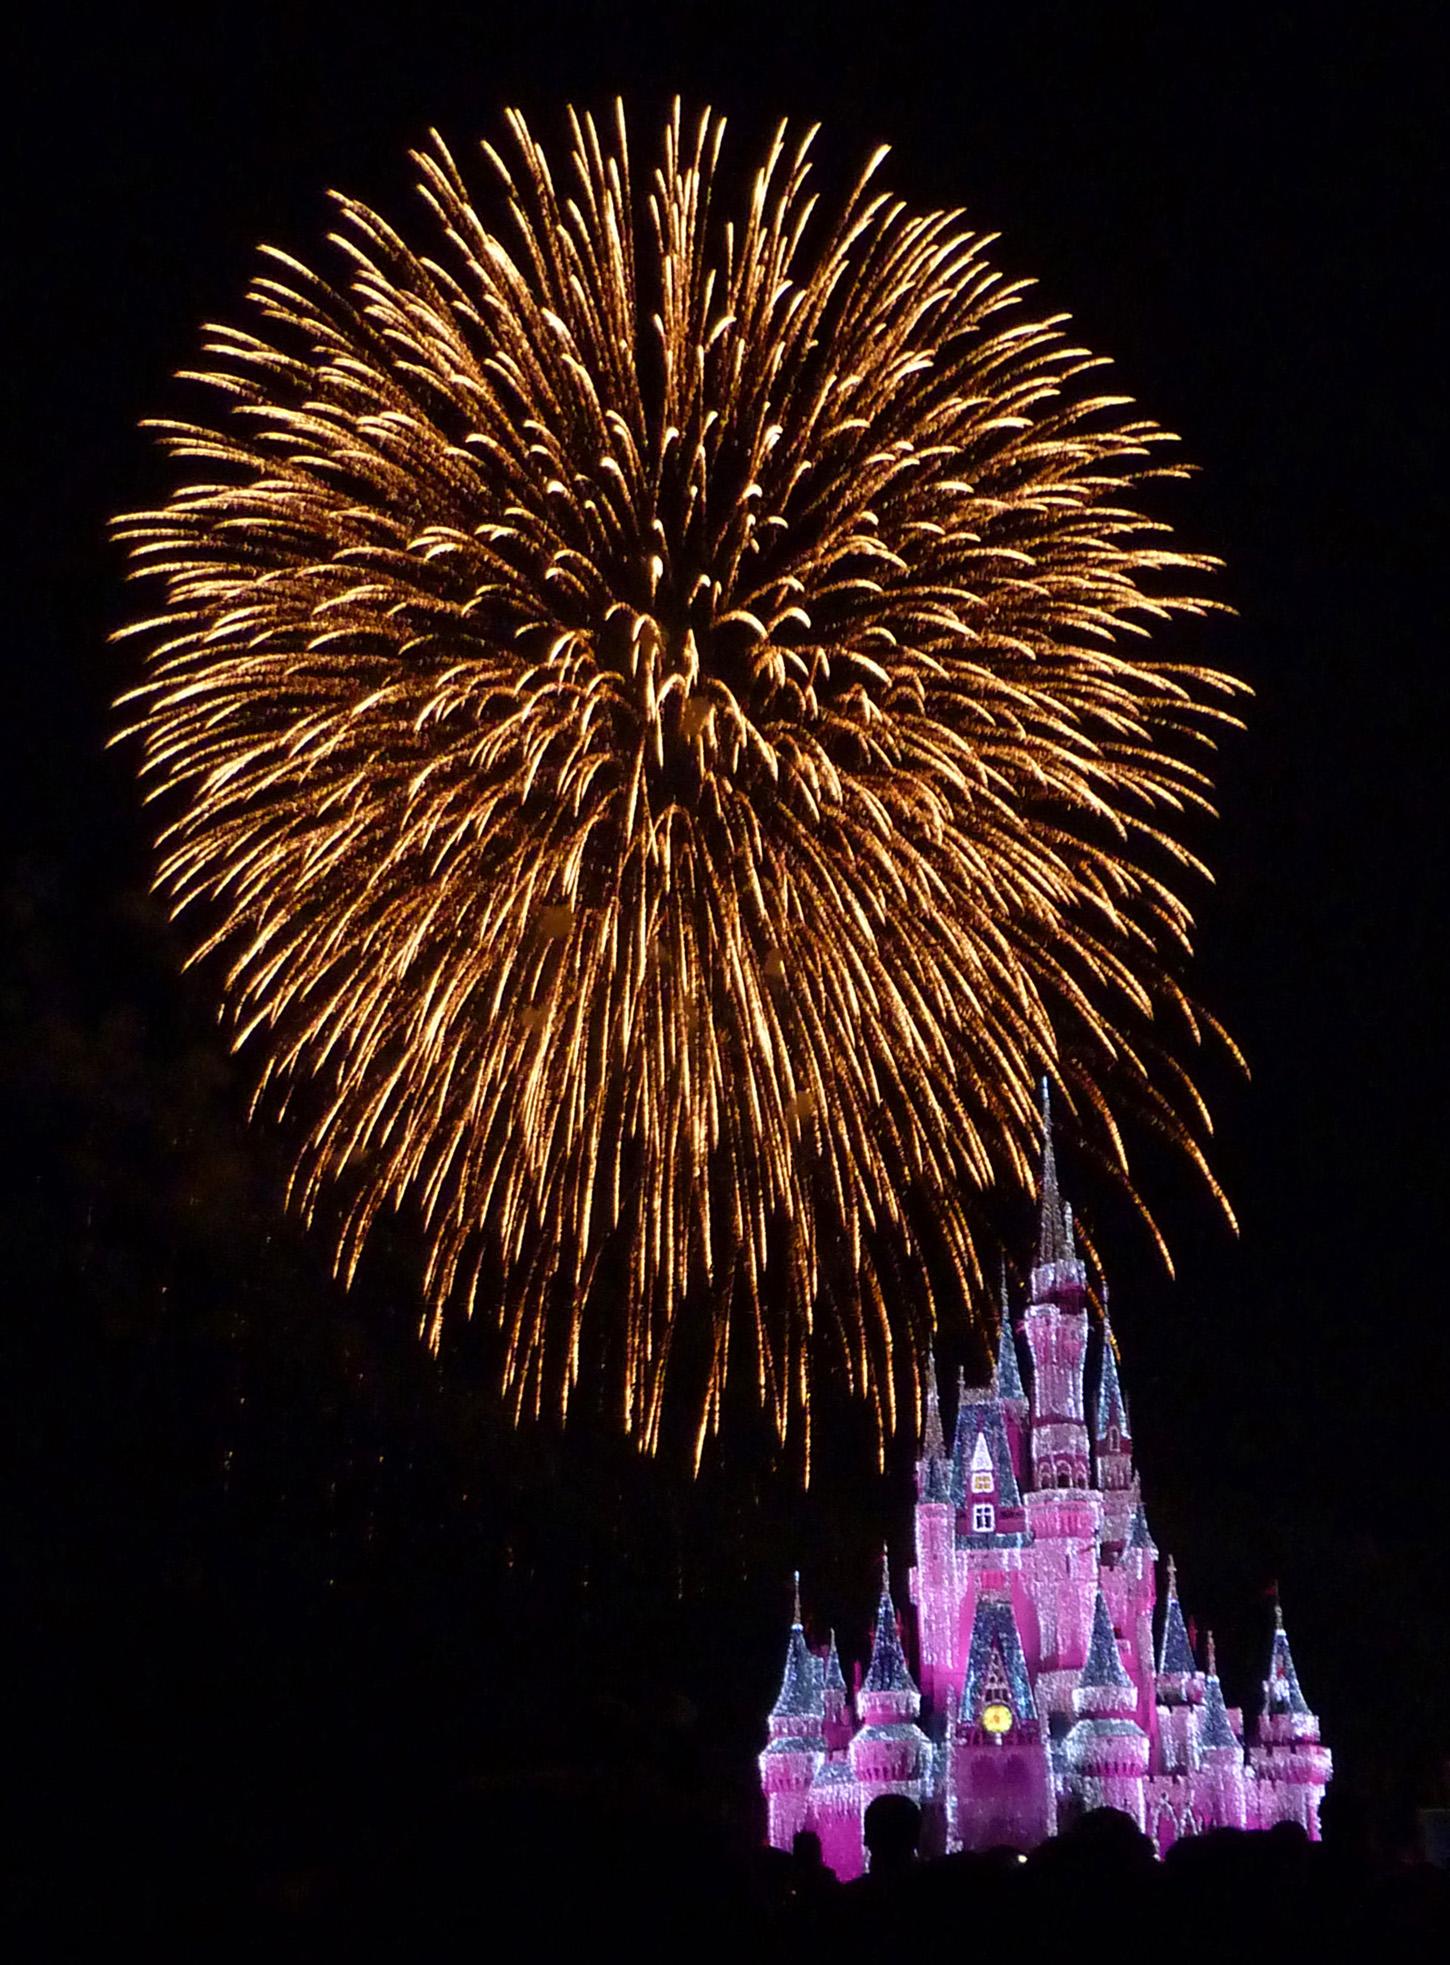 Wishes fireworks show at the Magic Kingdom in Walt Disney World - Orlando, Florida